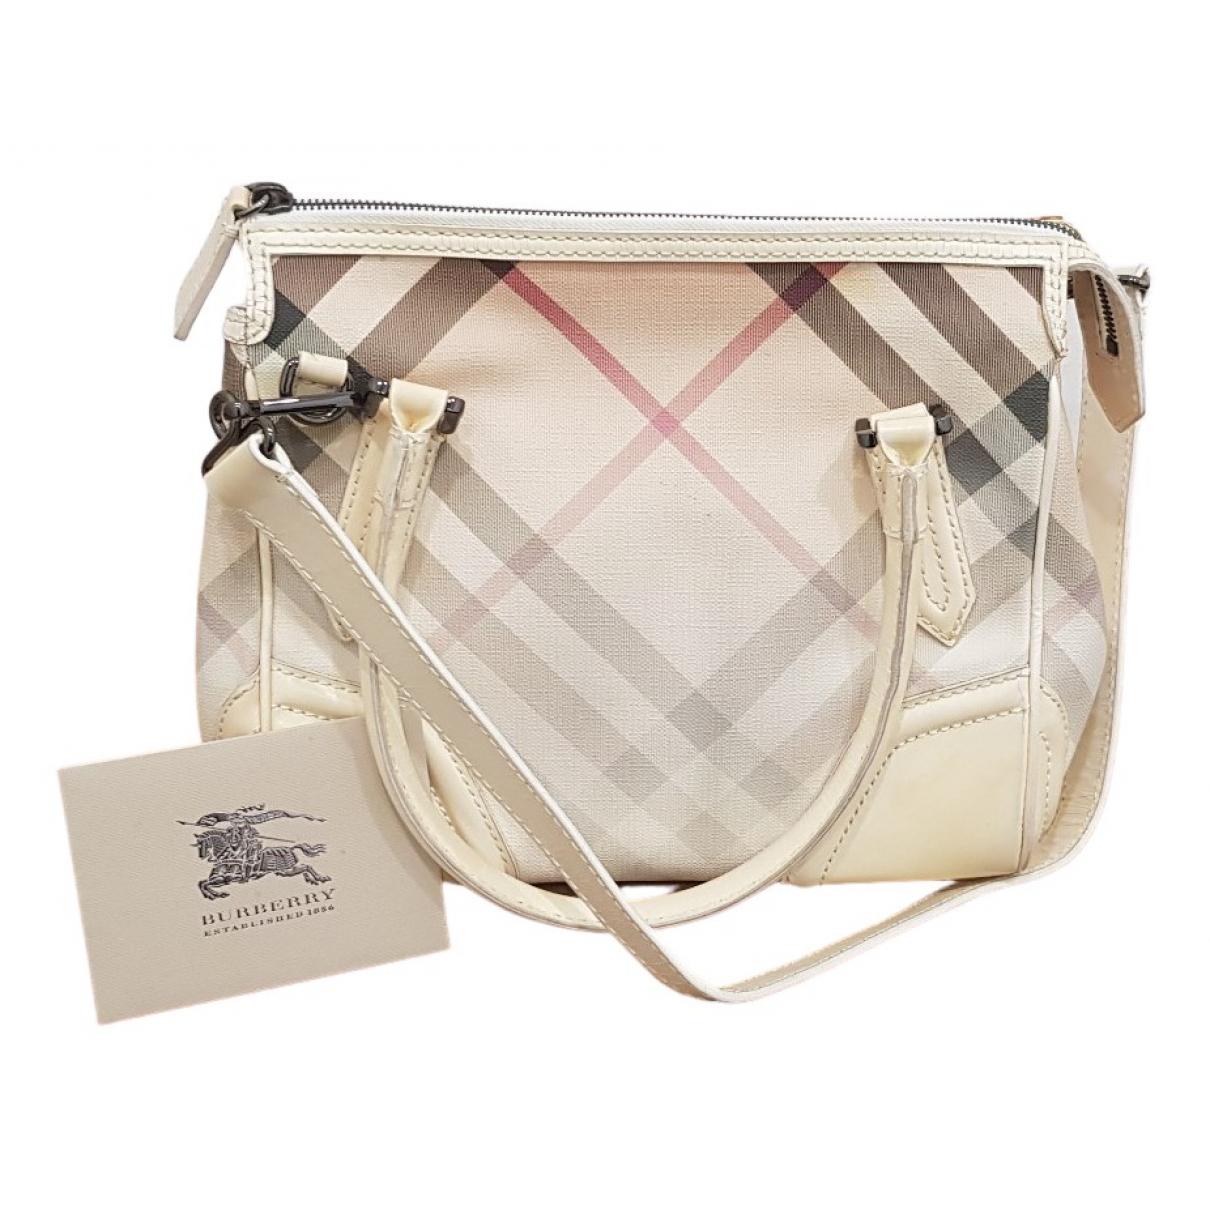 Burberry \N White Cloth handbag for Women \N